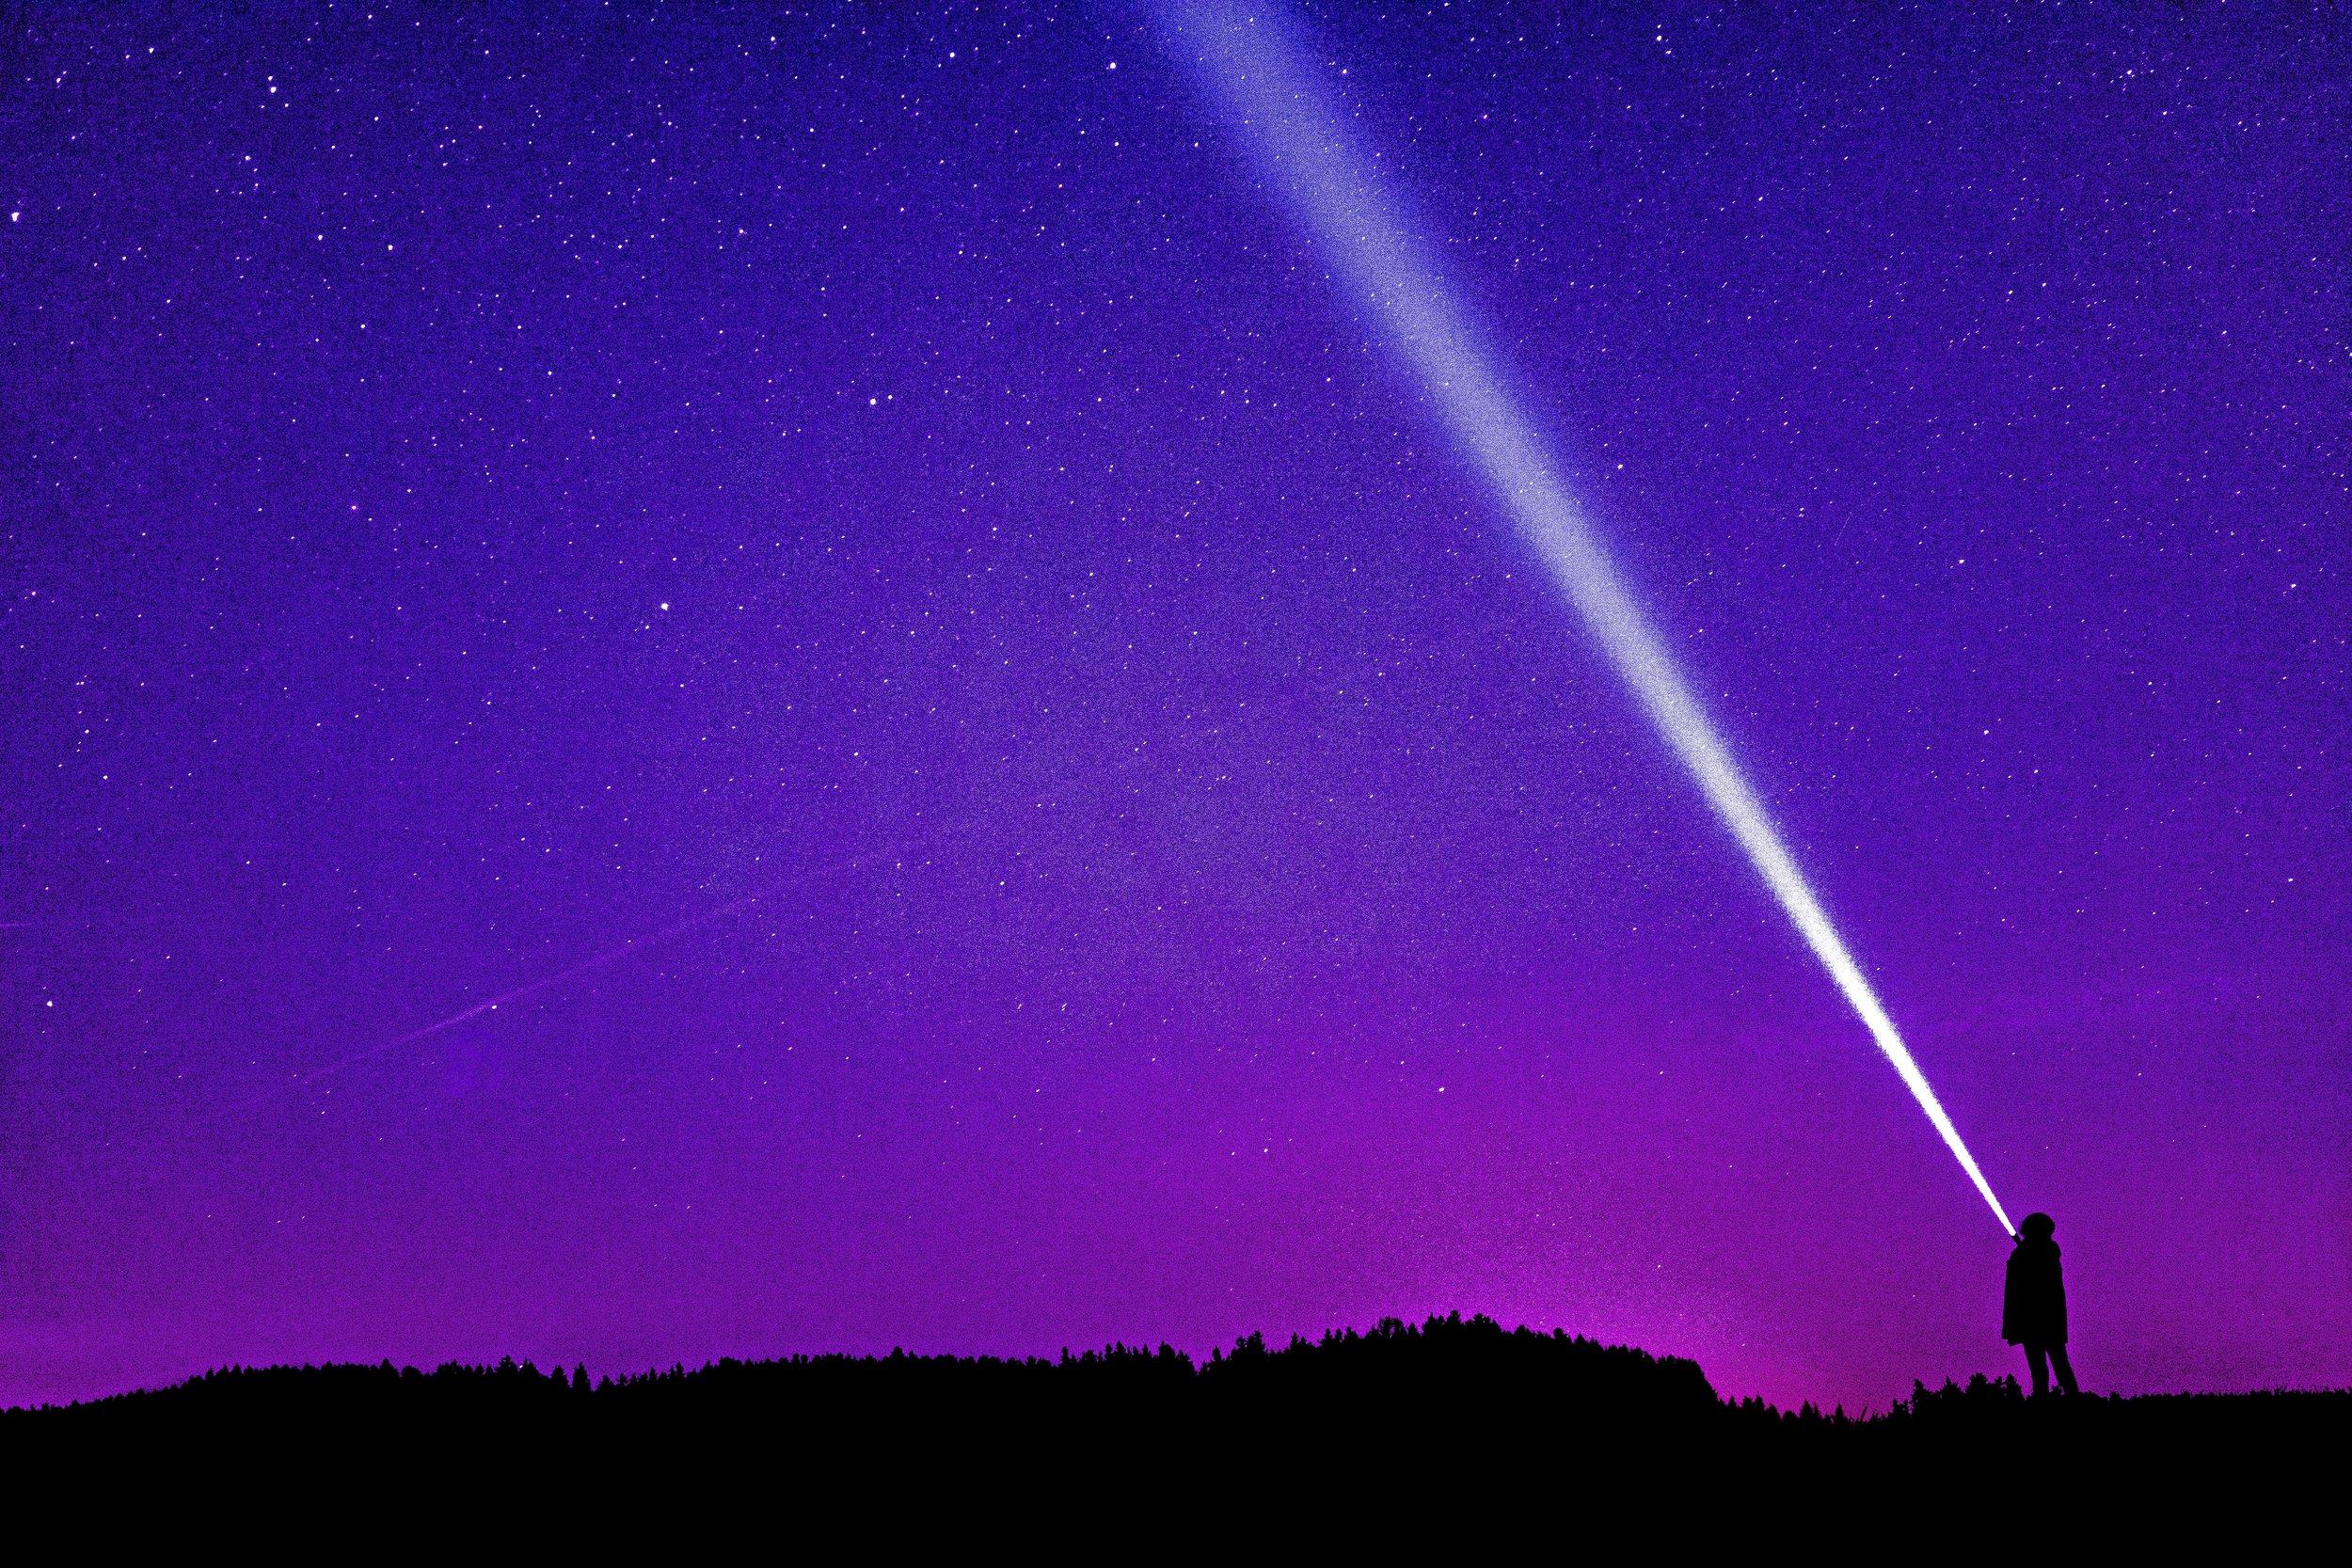 astronomy-colors-dark-957040.jpg